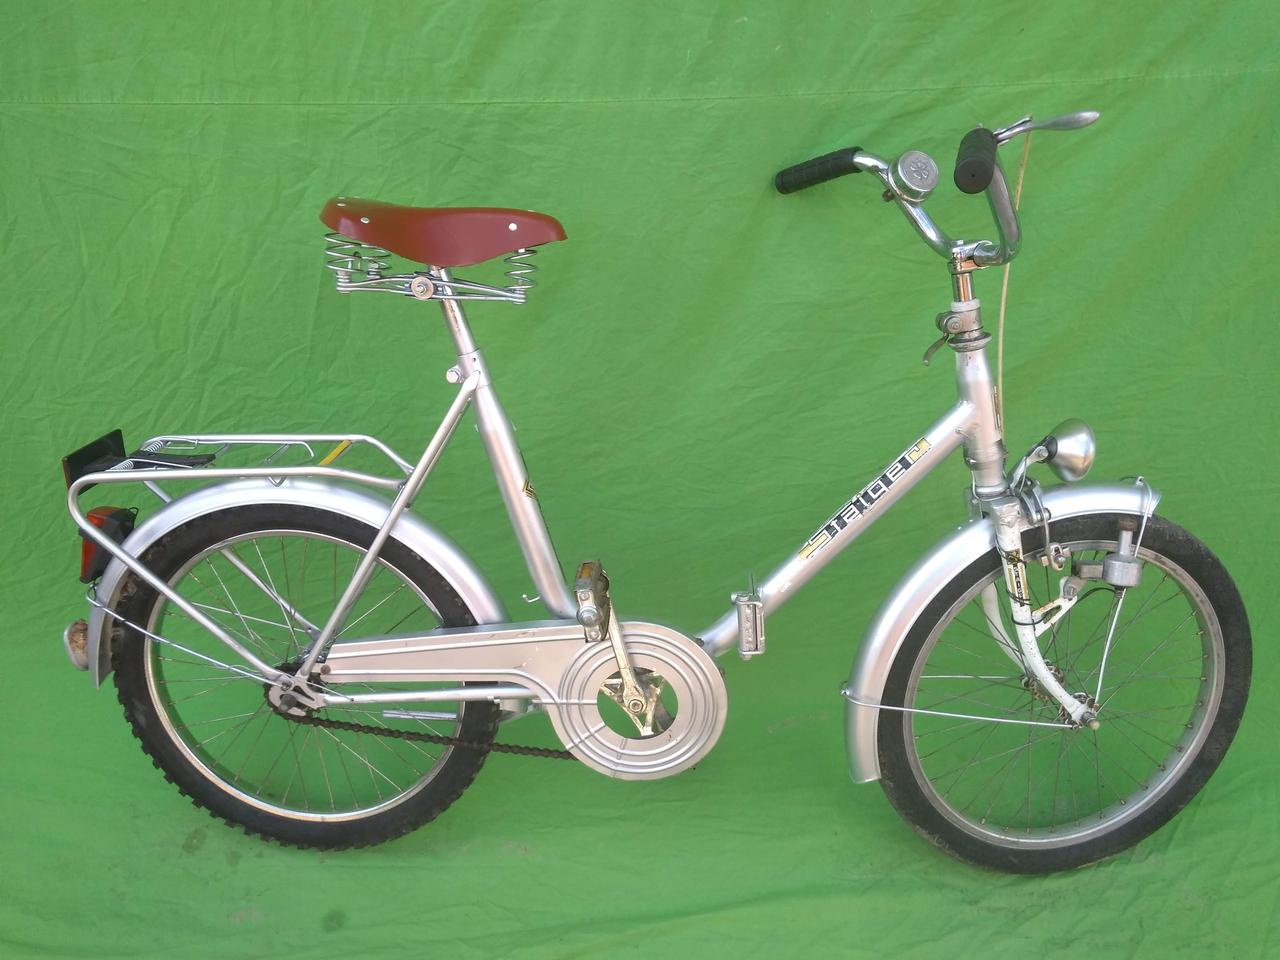 Складний велосипед Staiger, колеса 20